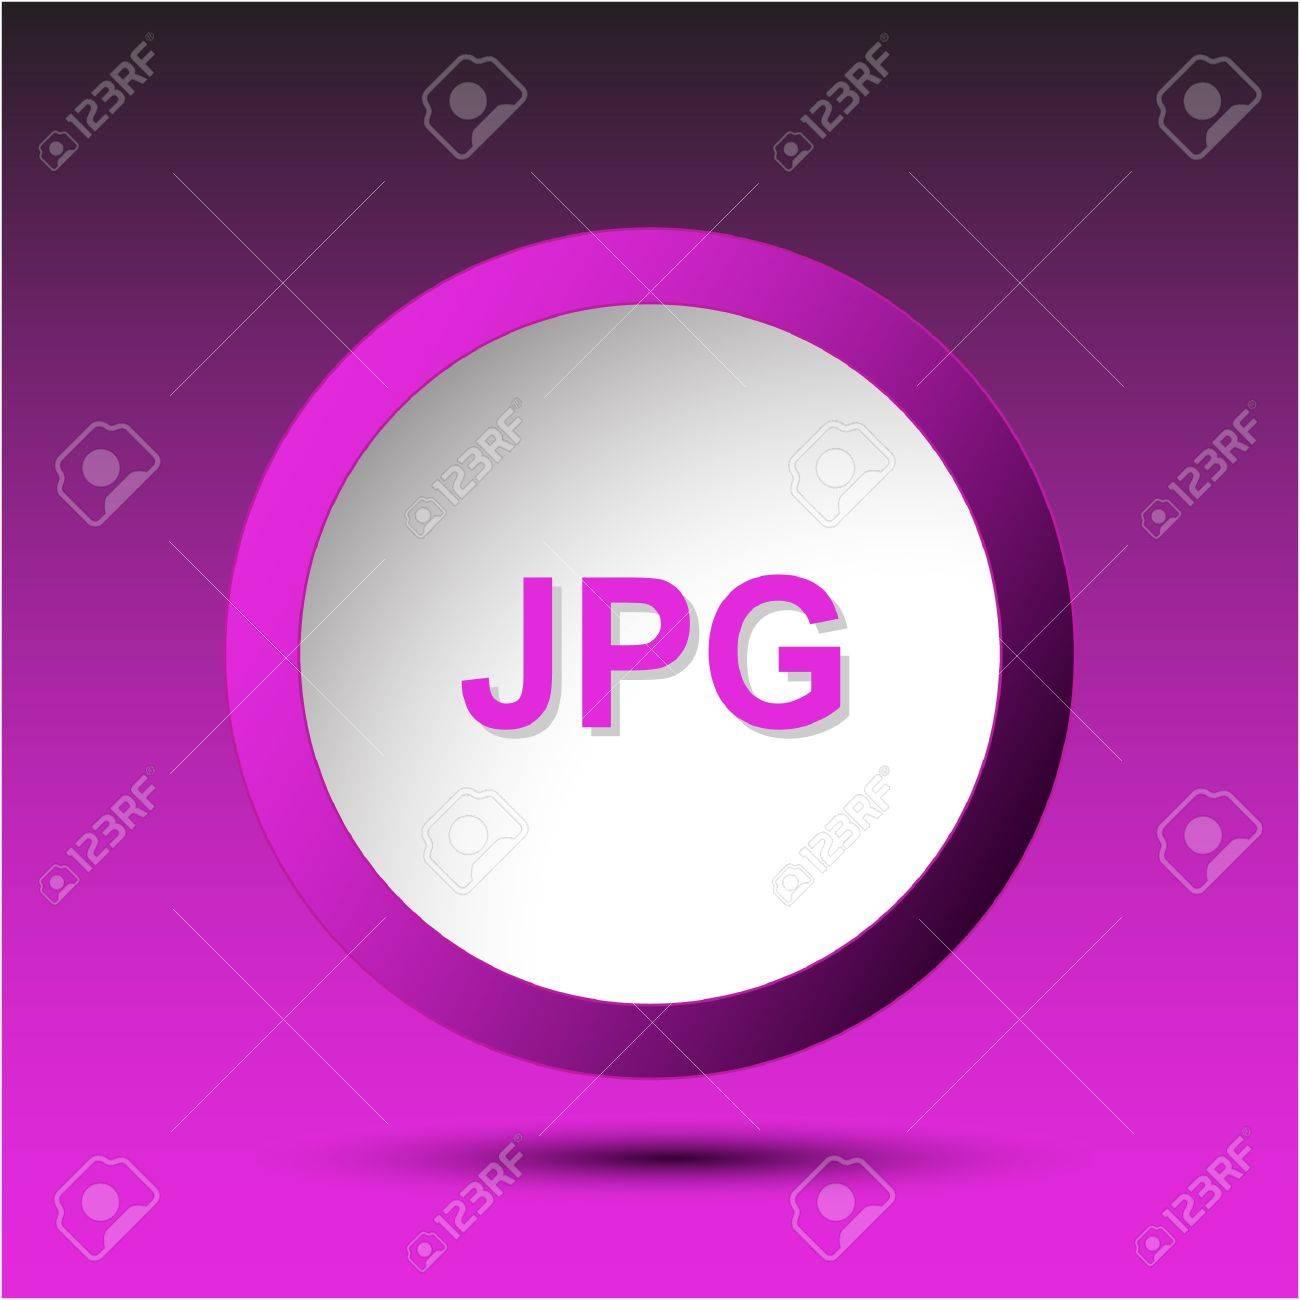 Jpg. Plastic button. Vector illustration. Stock Illustration - 15450680